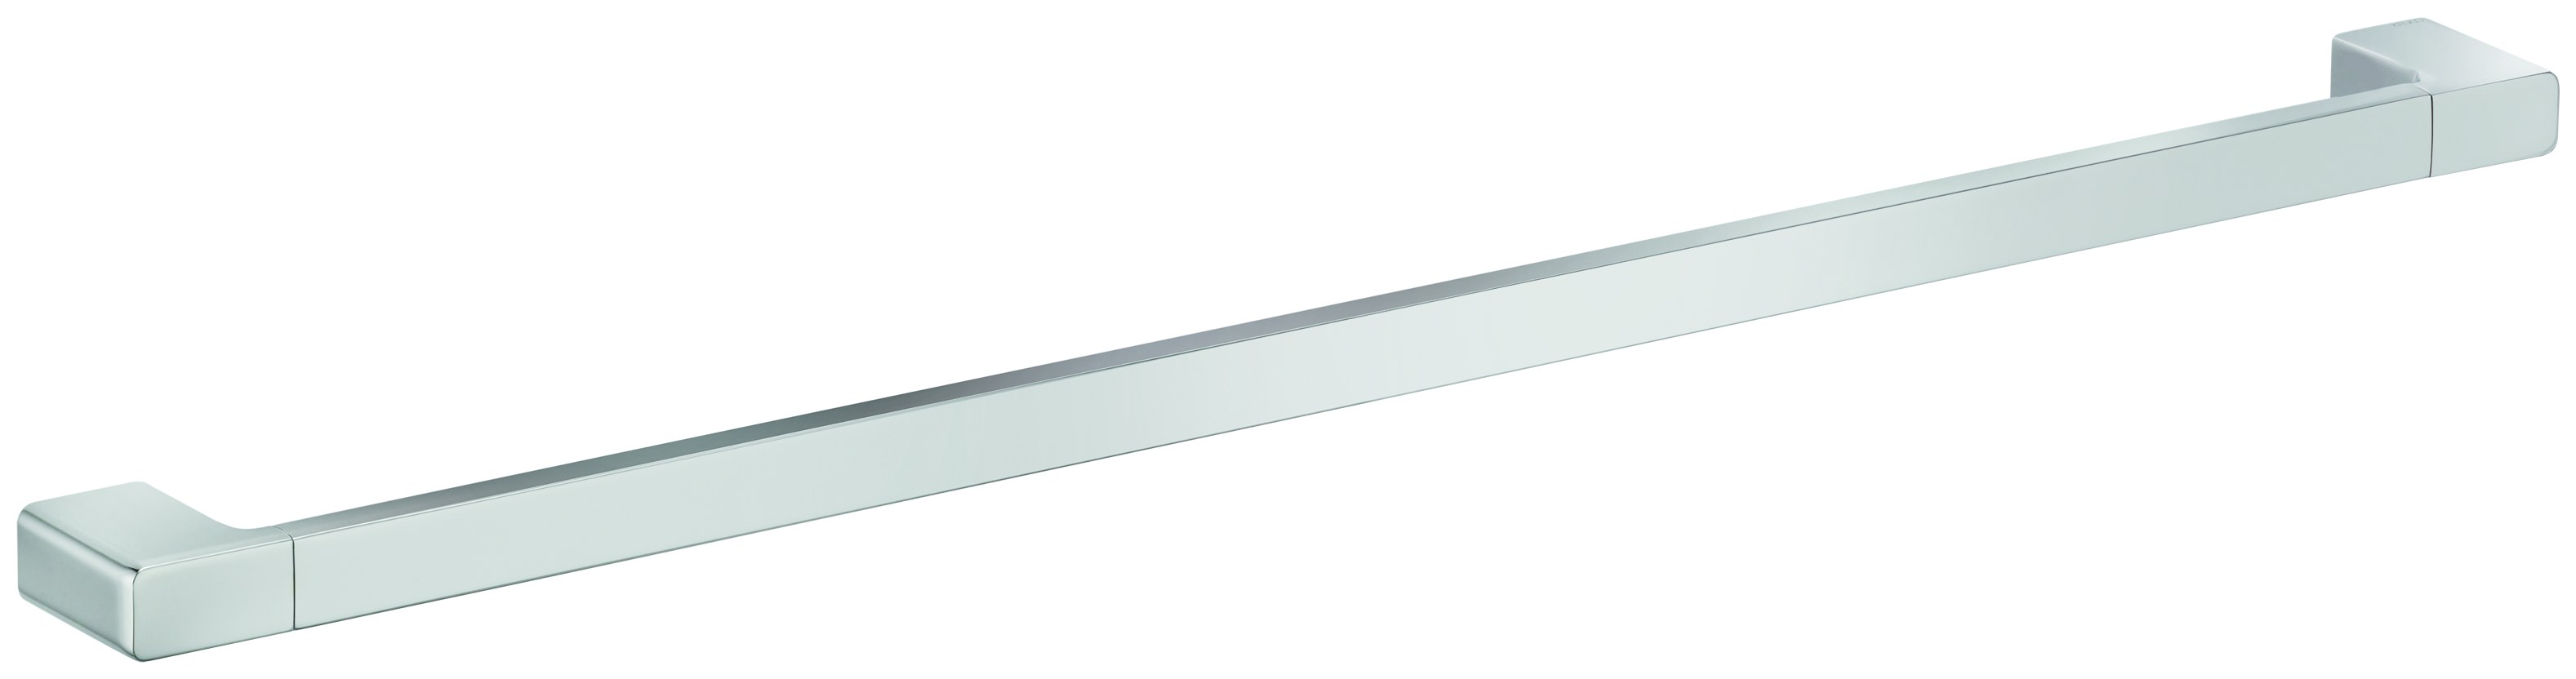 keuco collection moll badetuchhalter 800 mm verchromt 12701010800. Black Bedroom Furniture Sets. Home Design Ideas